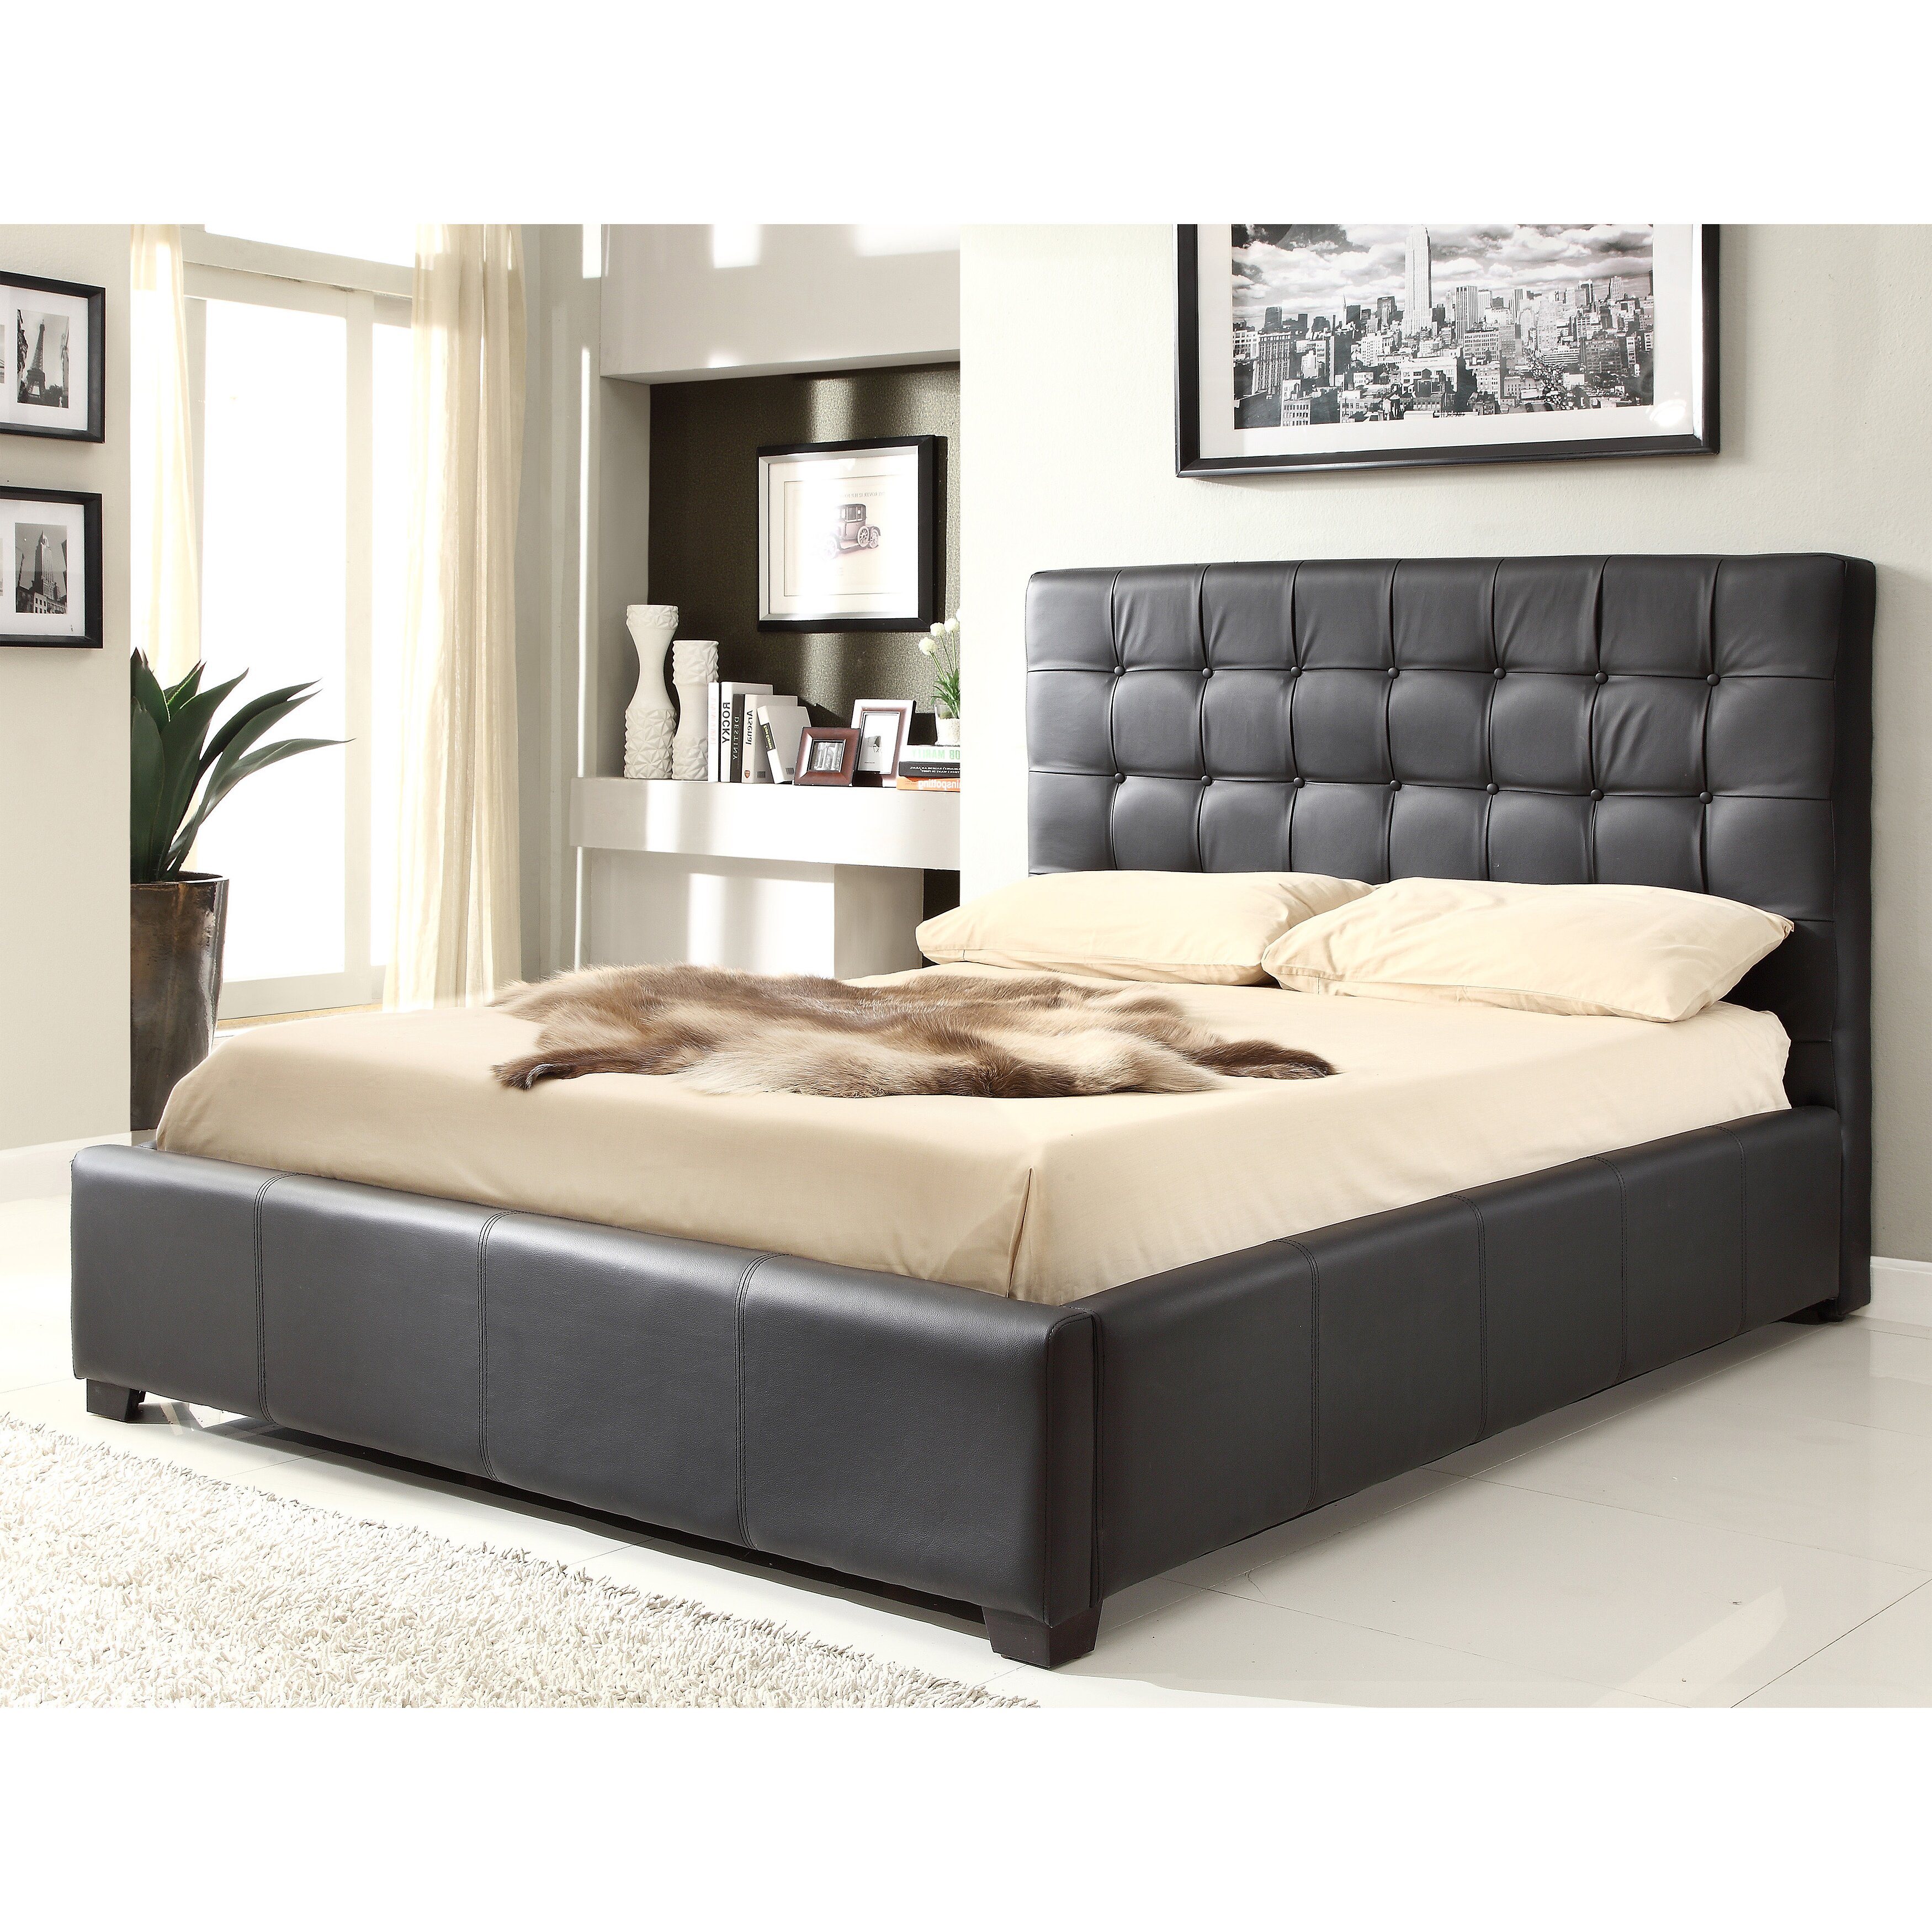 At Home Usa Athens Panel Customizable Bedroom Set Reviews Wayfair